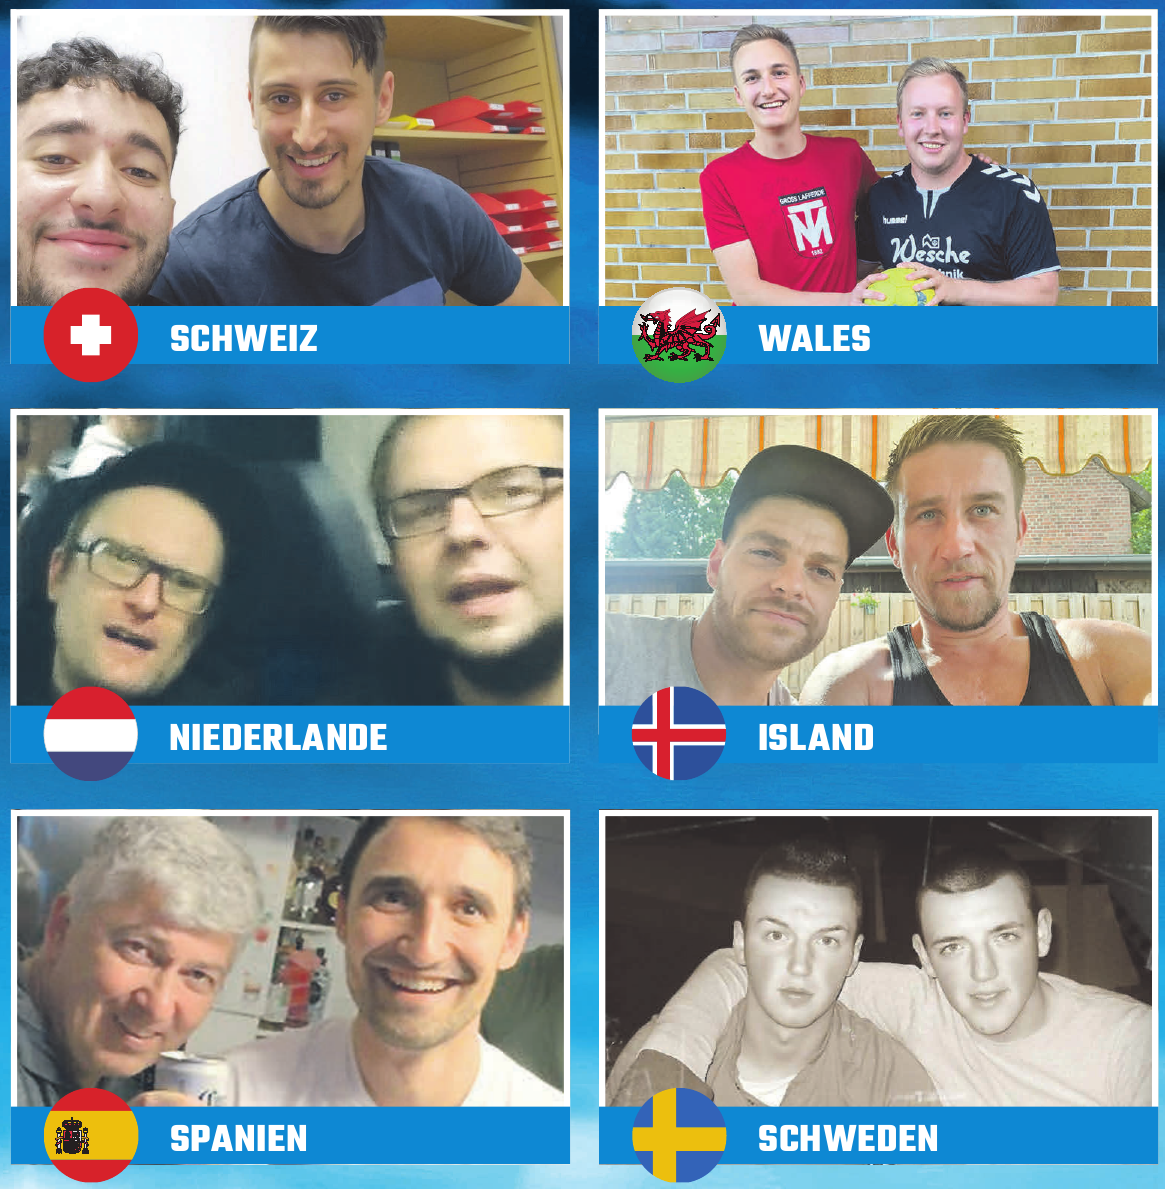 Anpfiff für den E-Soccer-Cup Image 3